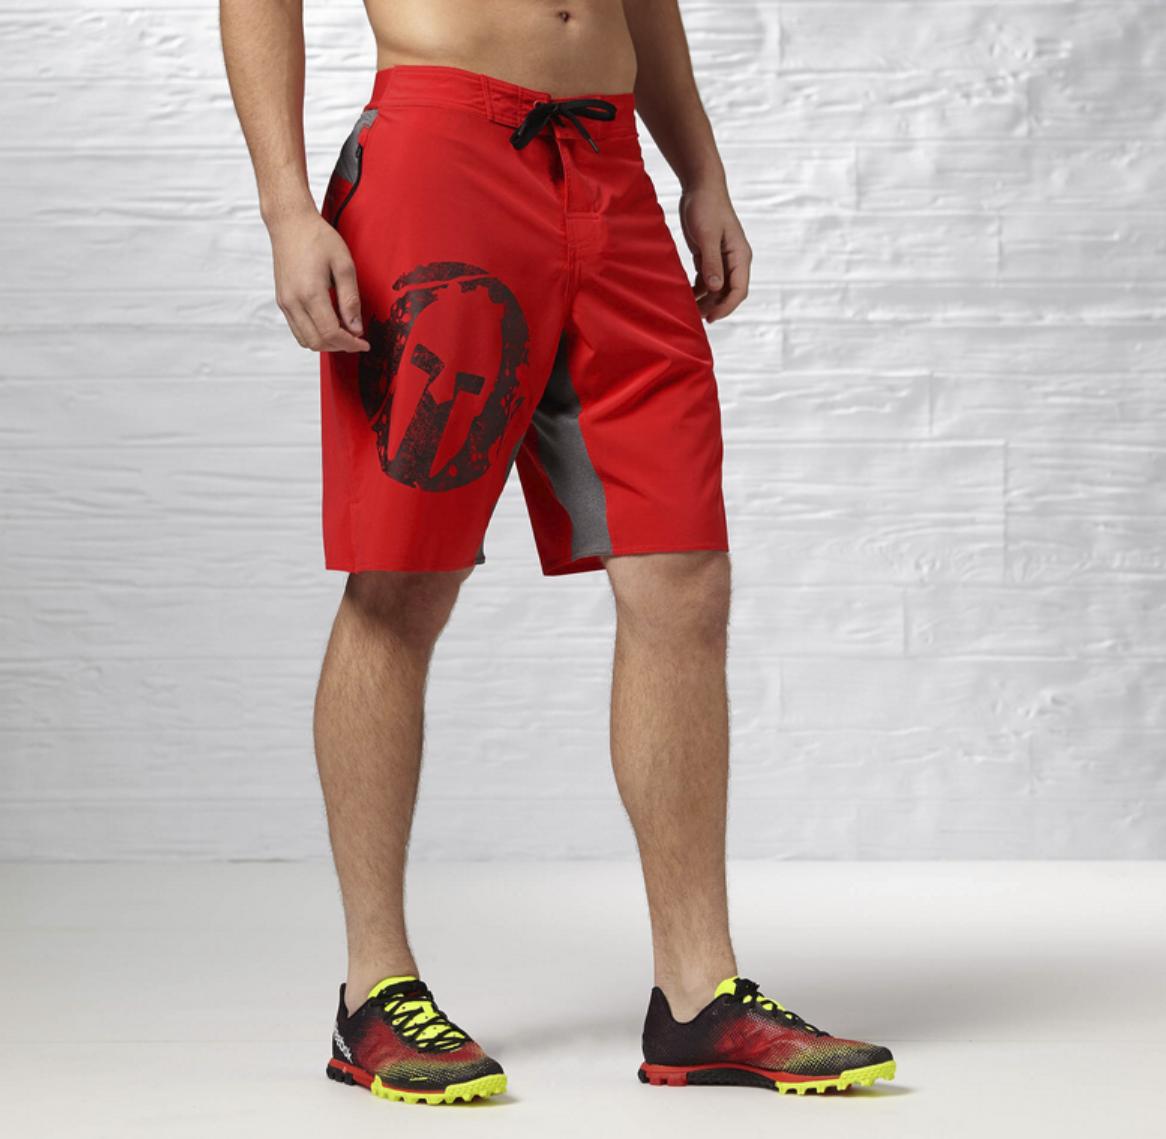 01956afeb0 Spartan Race Men's Board Shorts | Clothing | Spartan race, Mens ...